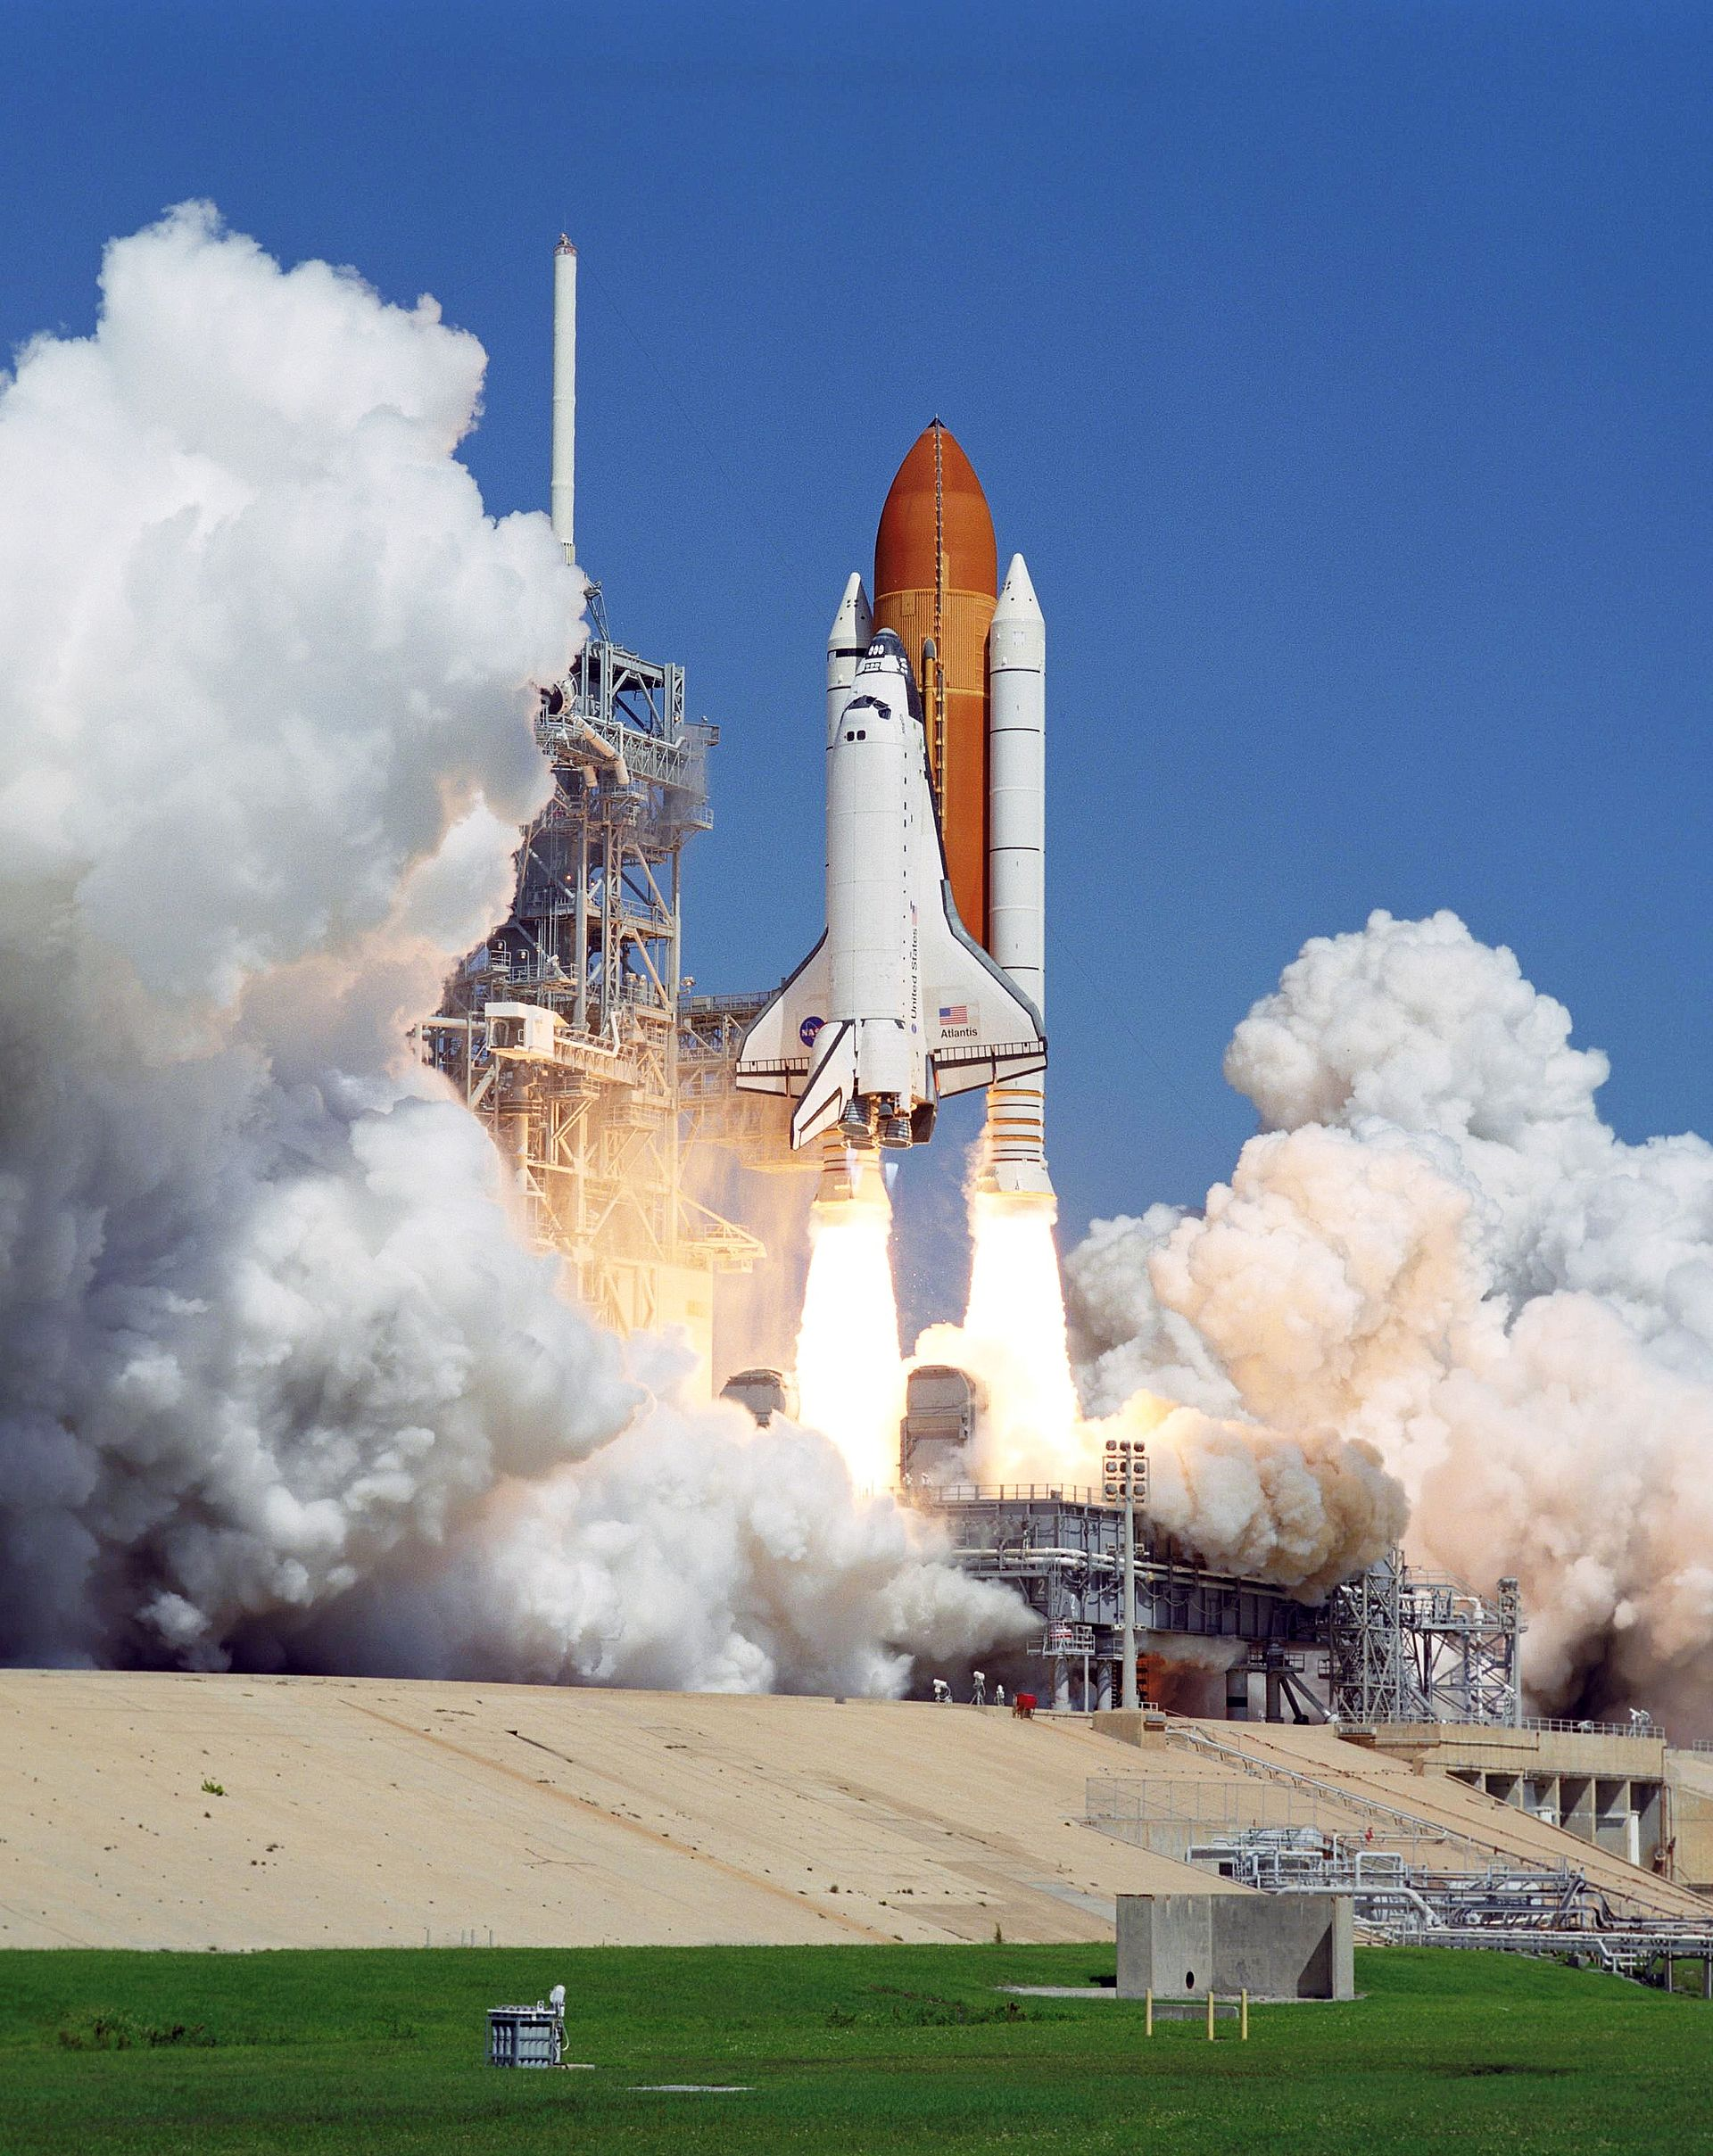 space shuttle erster start -#main